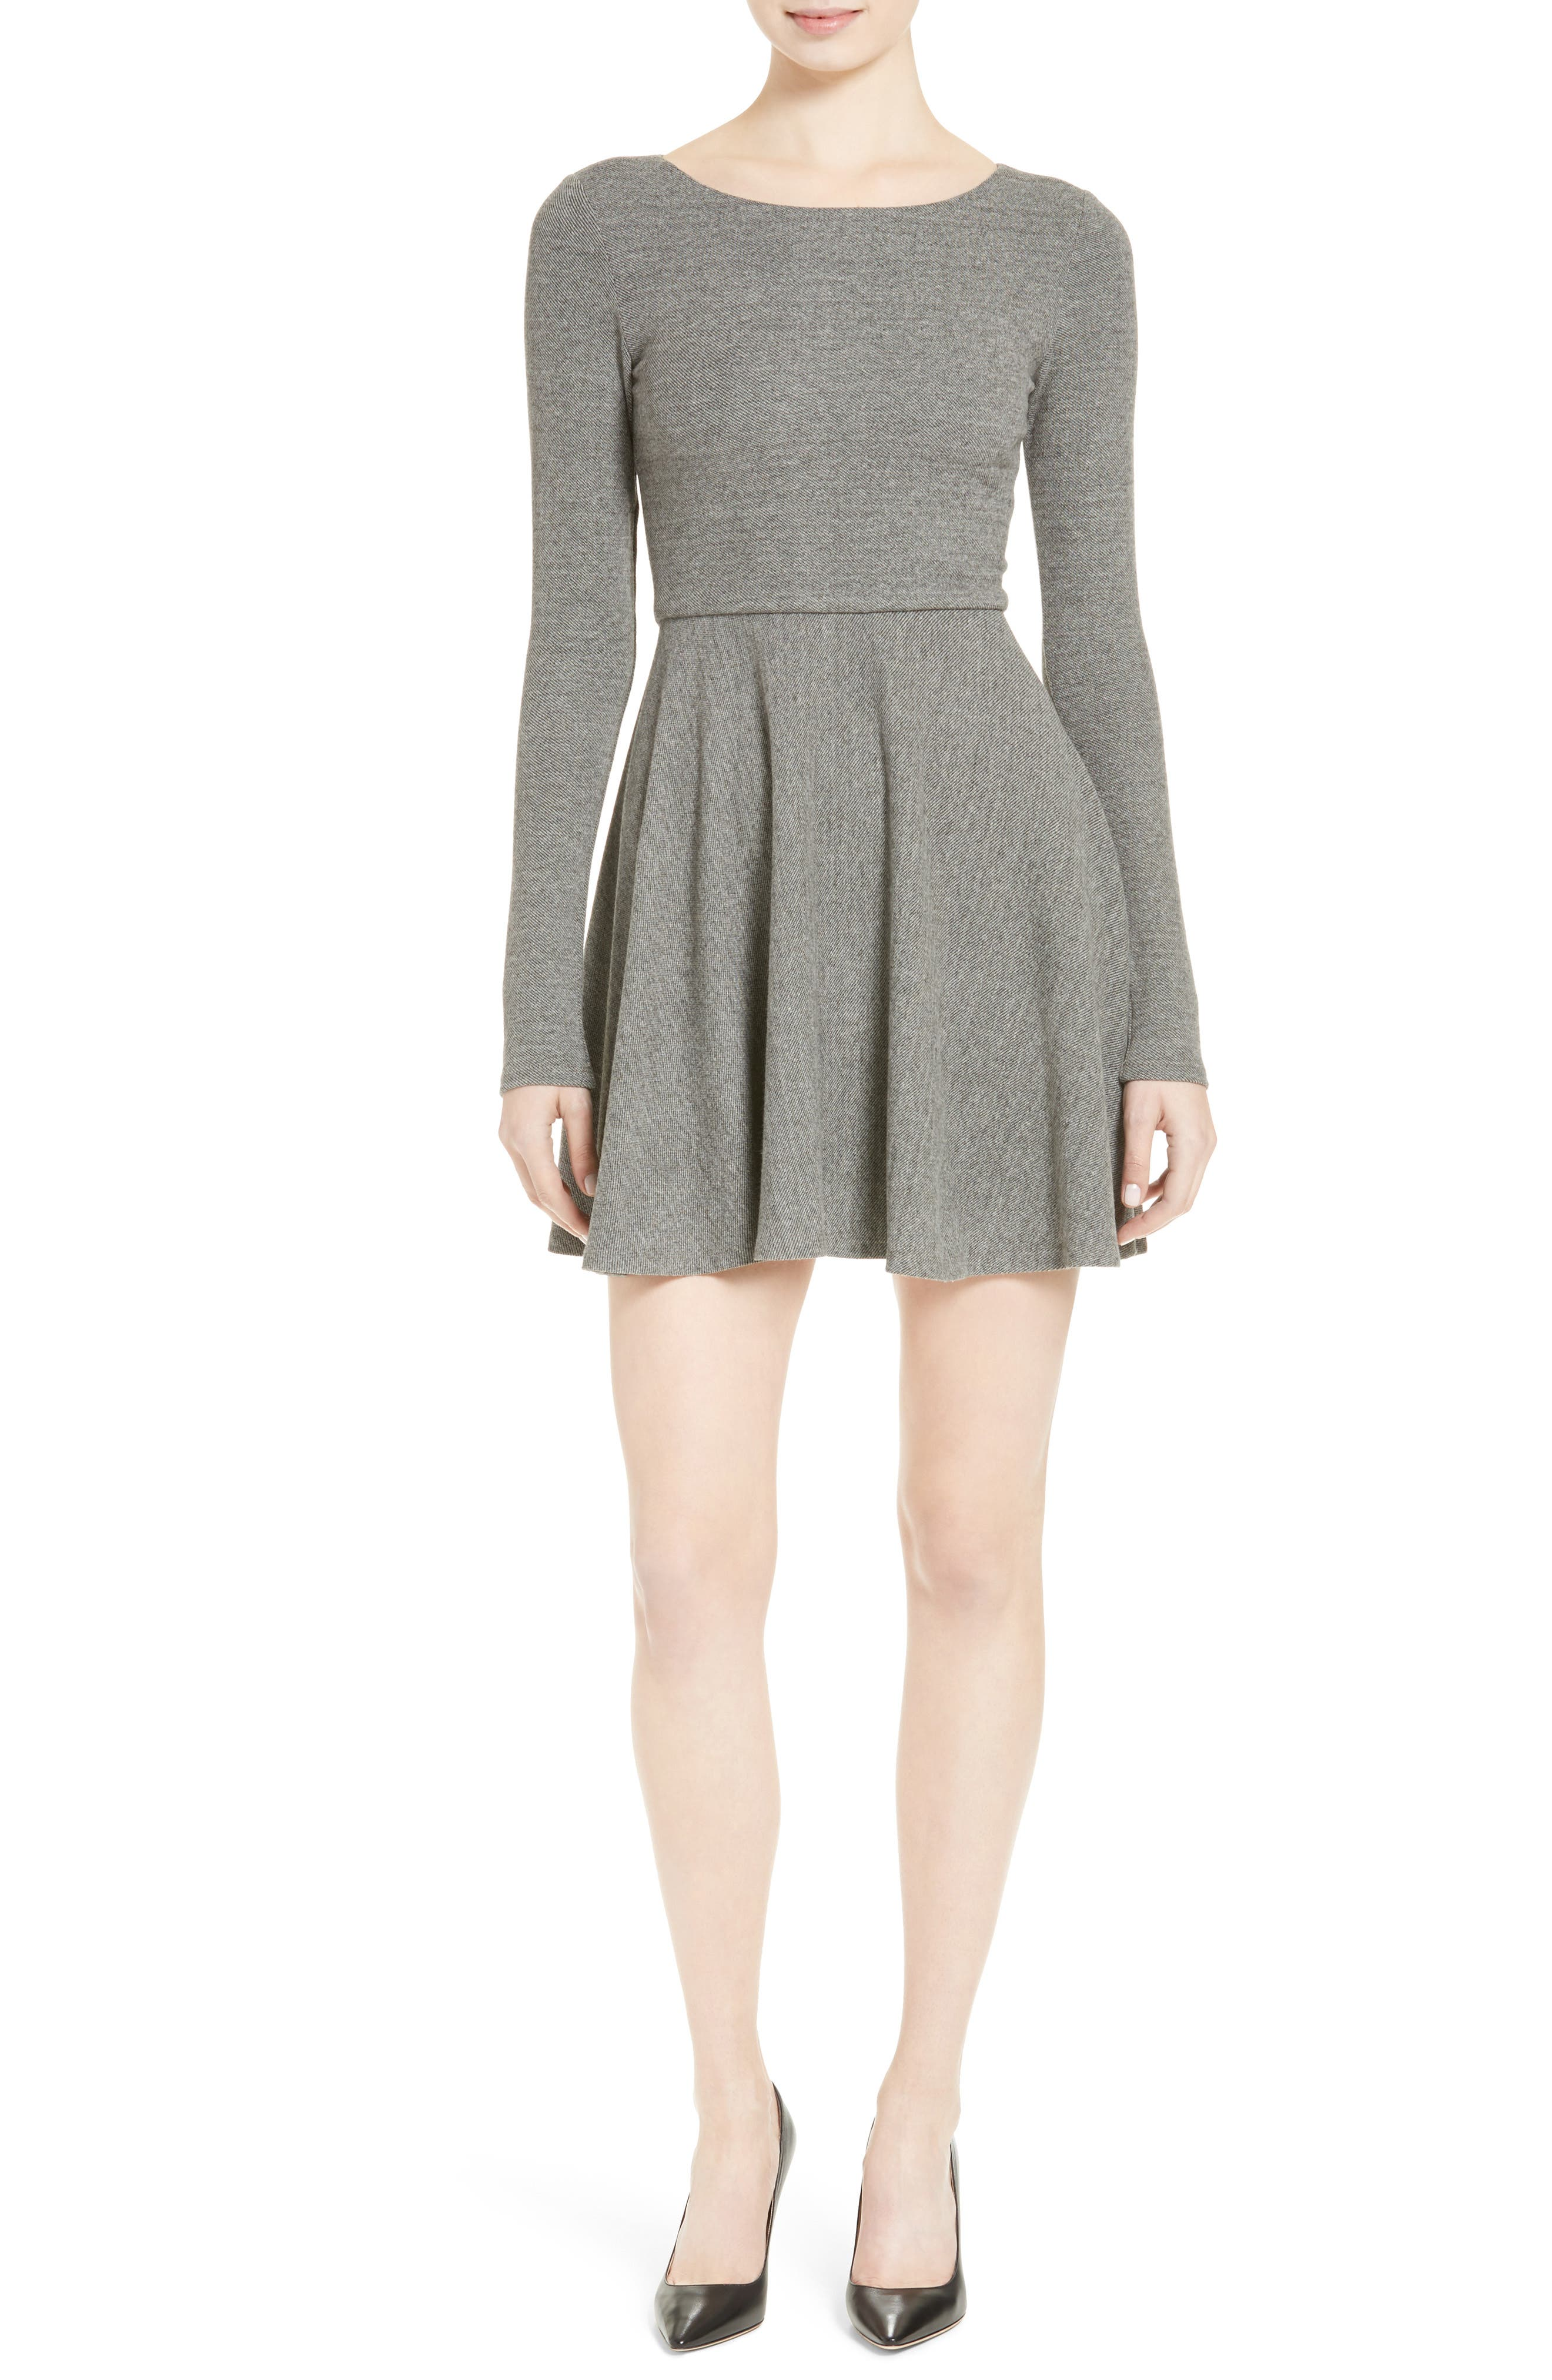 Alternate Image 1 Selected - Alice + Olivia 'Brinley' Long Sleeve Mini Dress